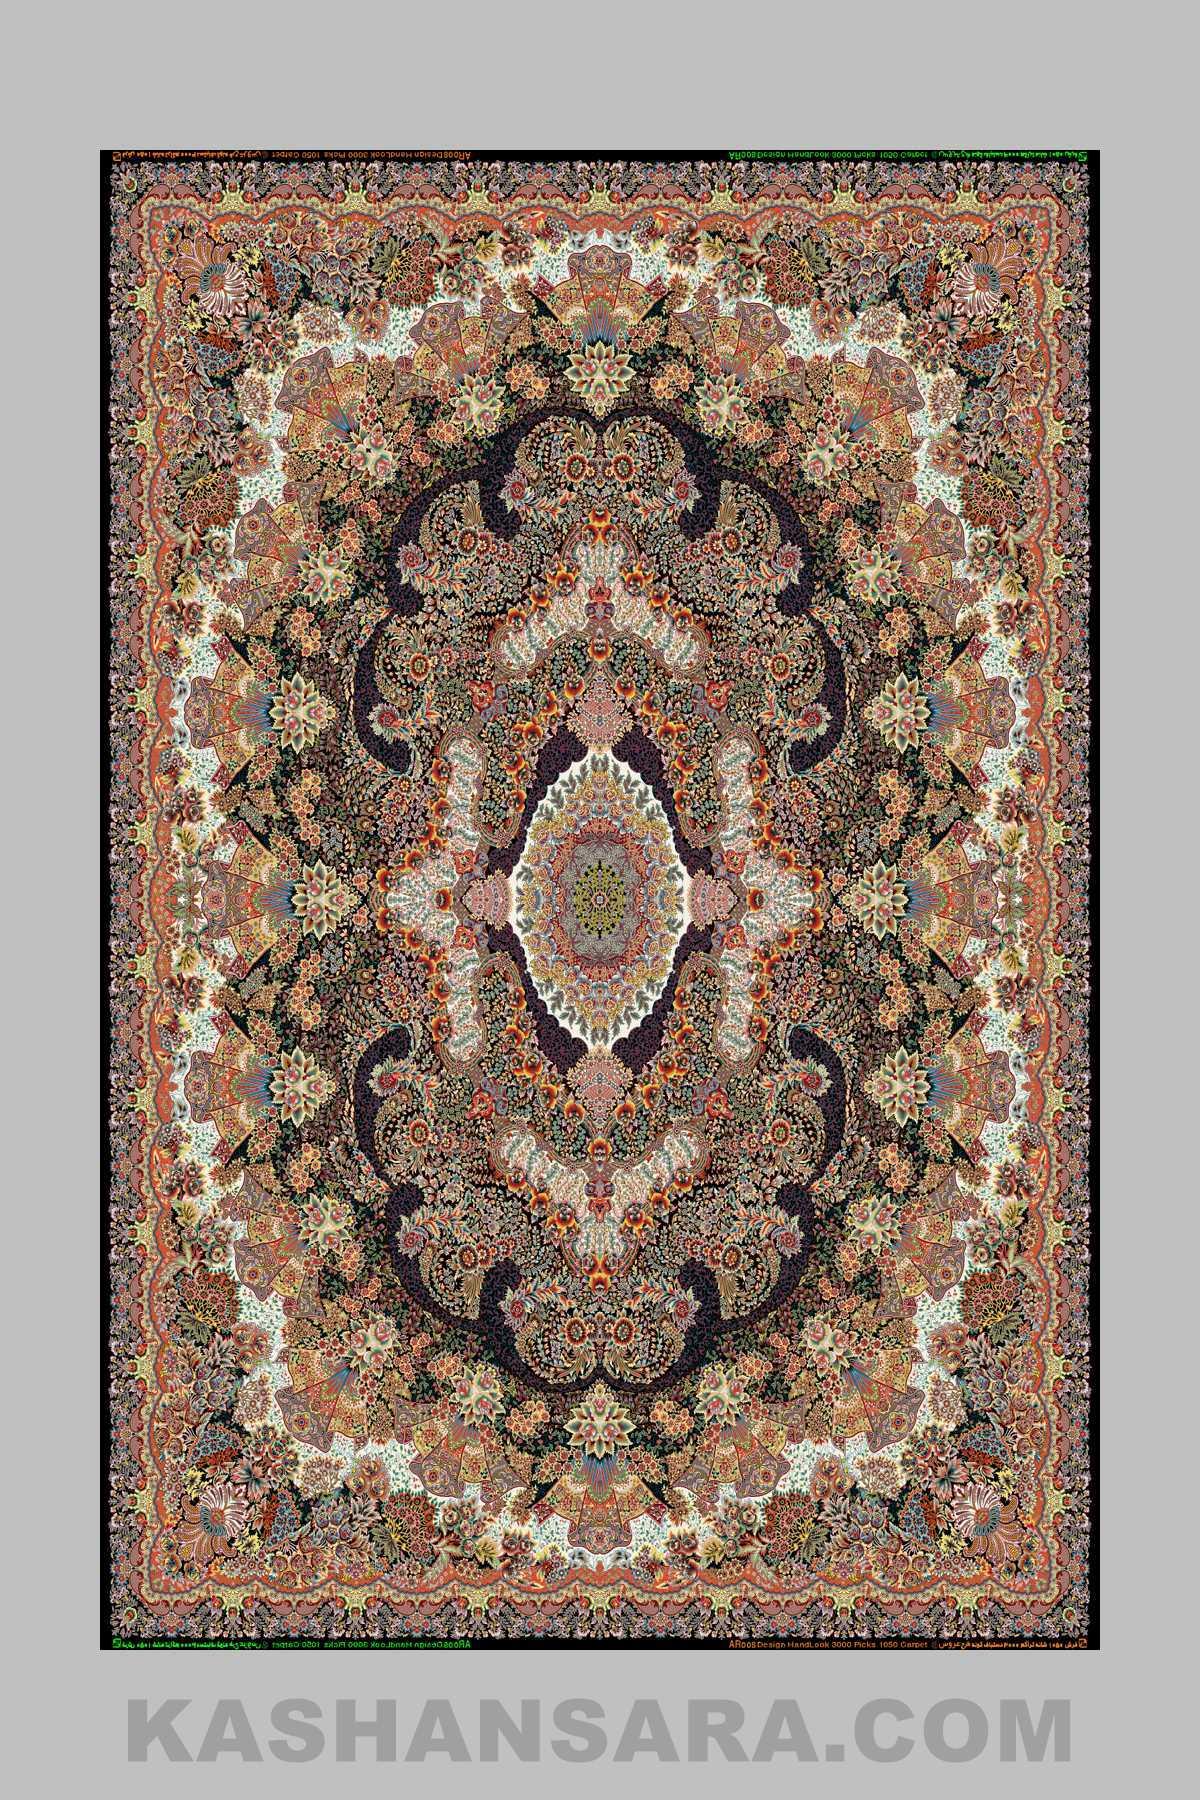 PAYAR-1050-aros Sormei 1050-12001800